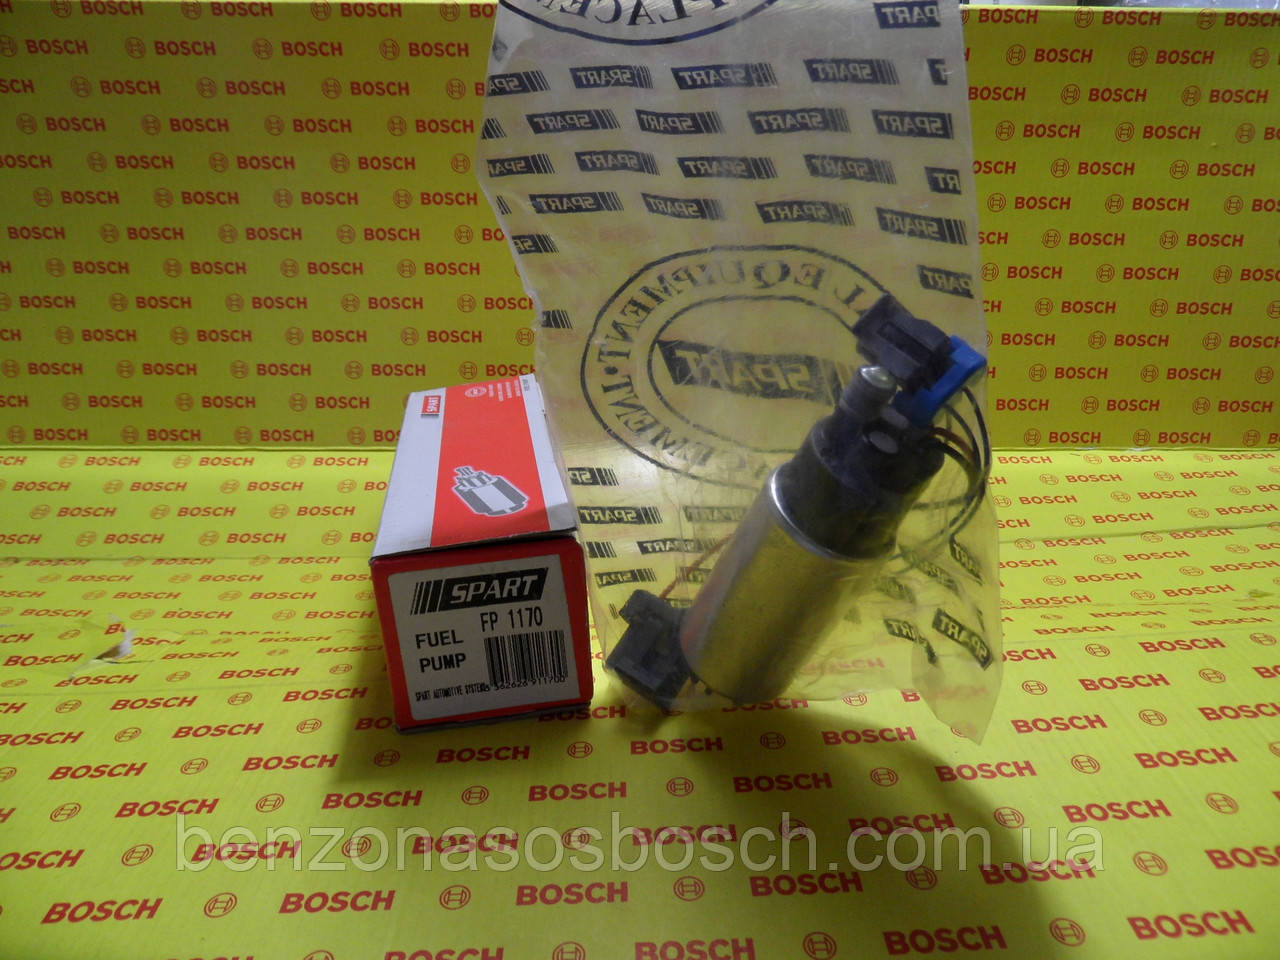 Электробензонасос SPART, FP 1170